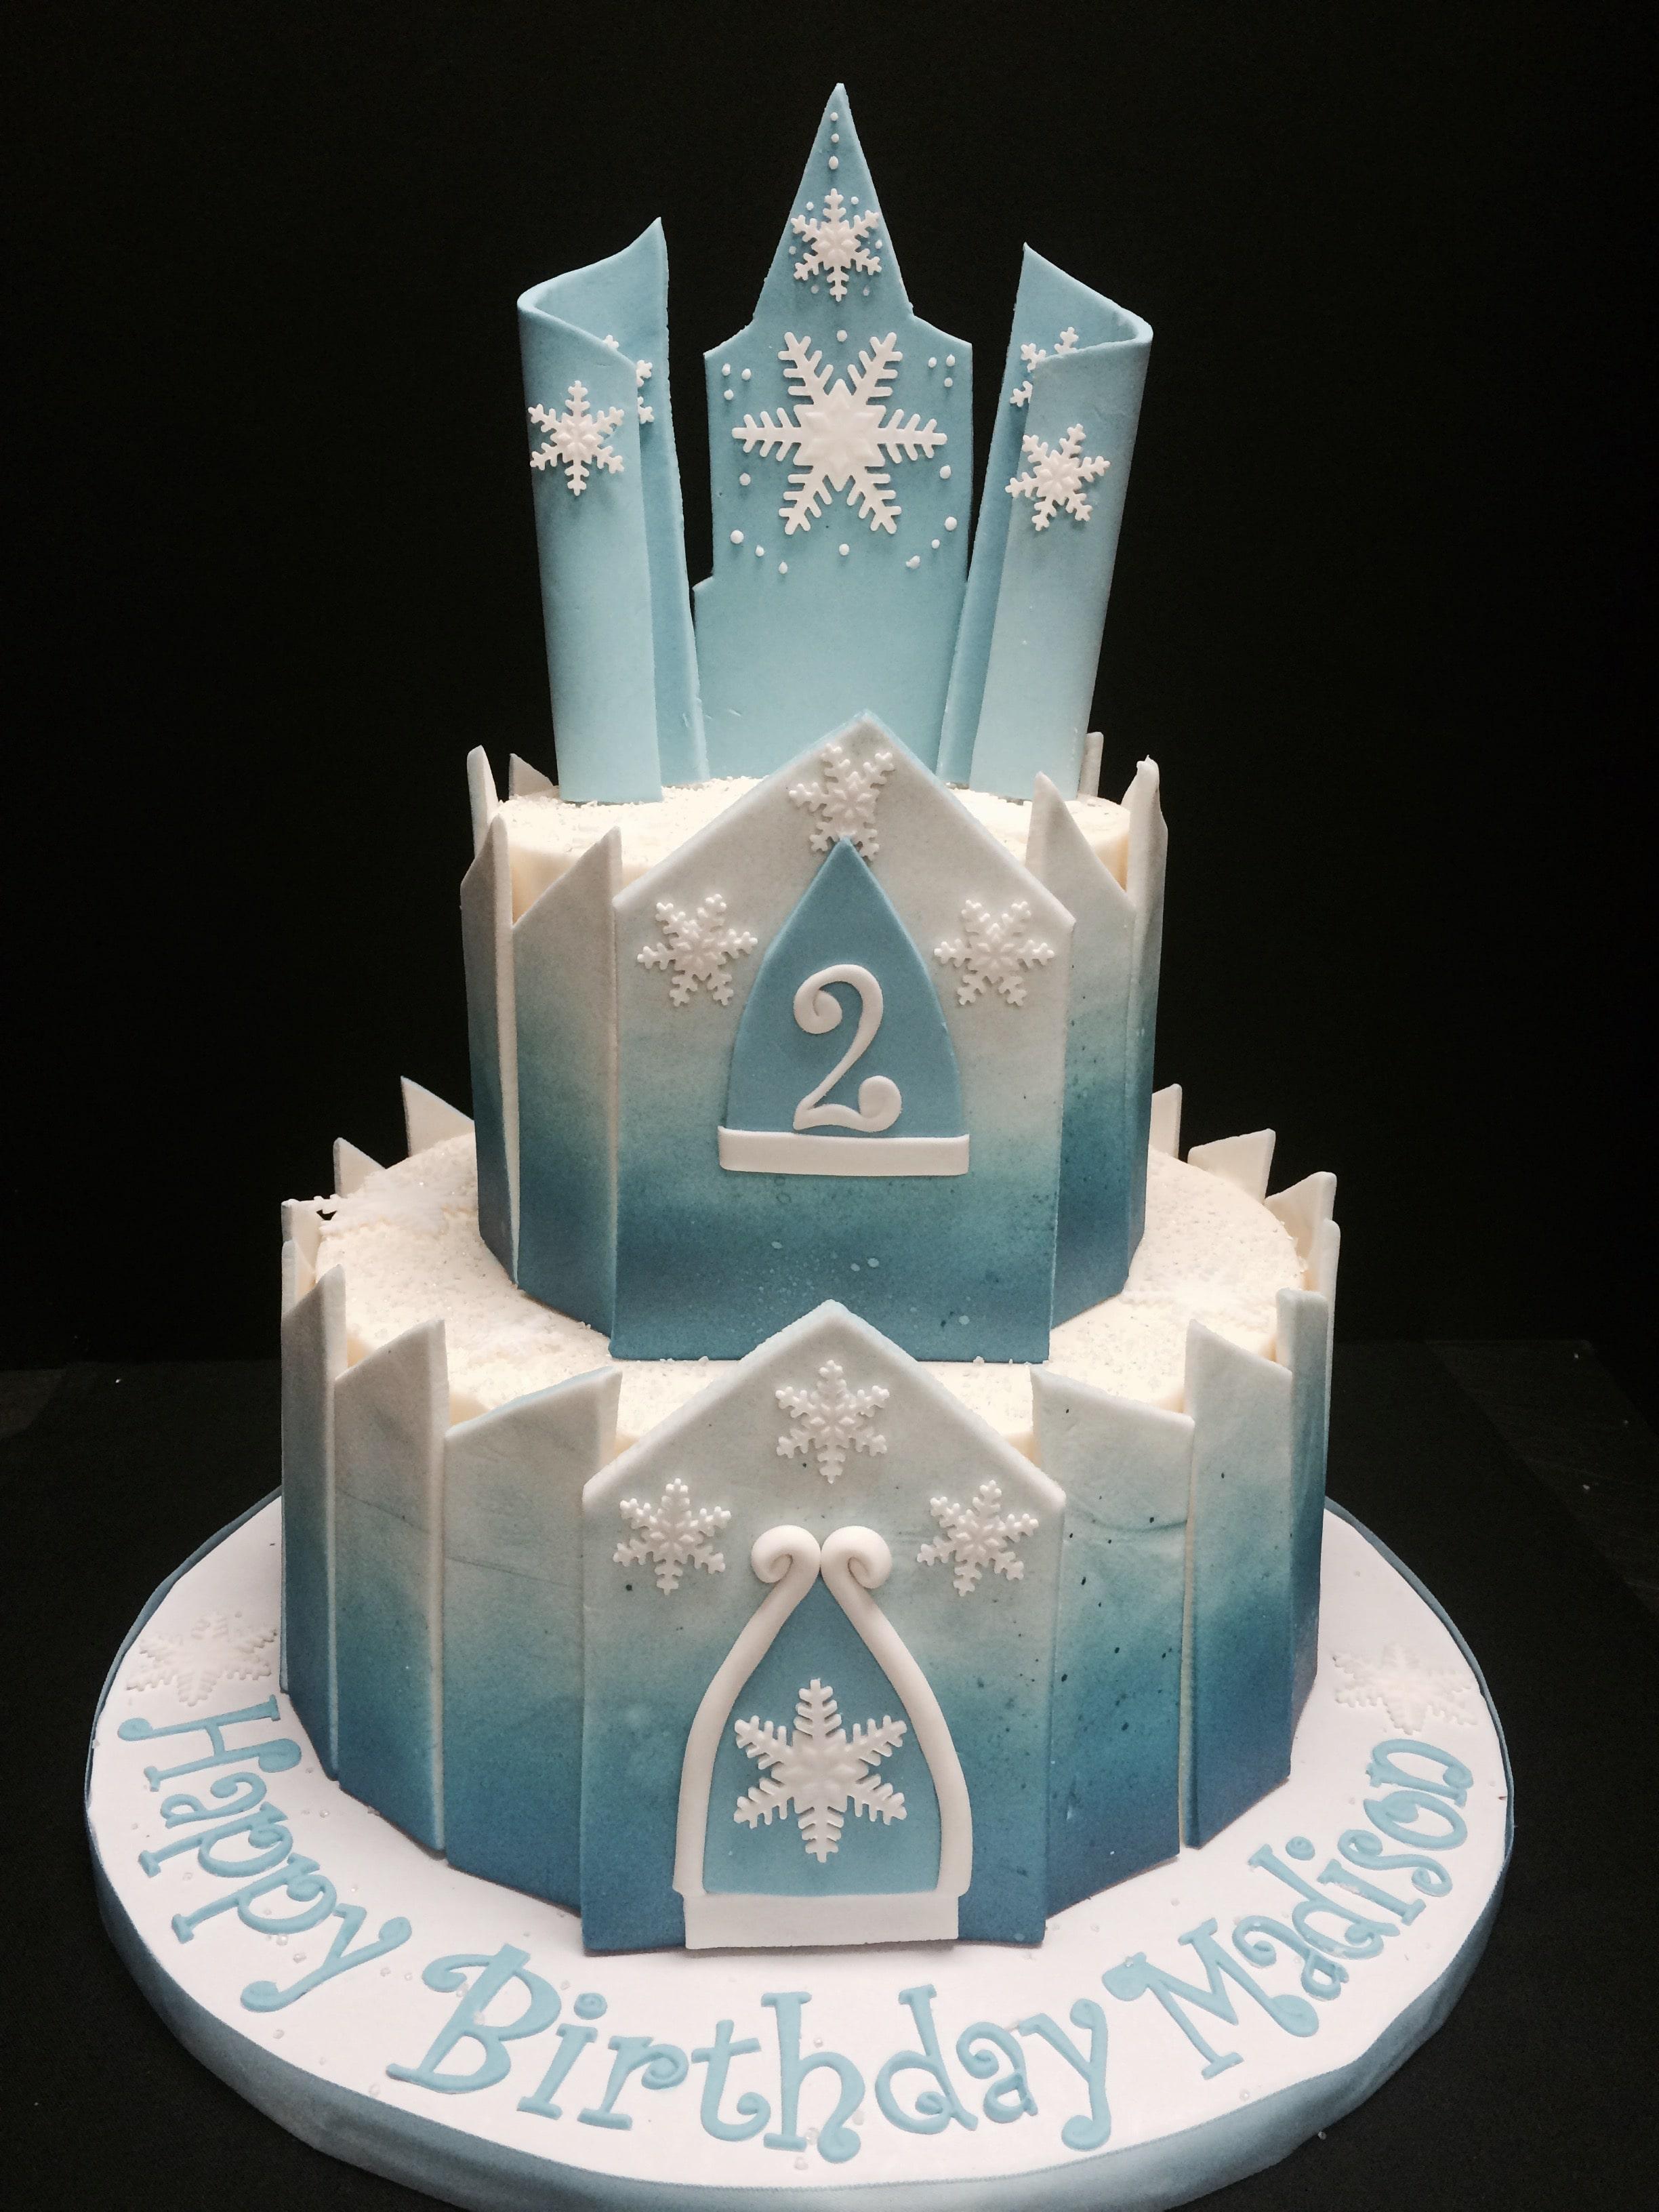 Awesome Elsa Castle Birthday Cake Croissants Bistro Bakery Personalised Birthday Cards Petedlily Jamesorg